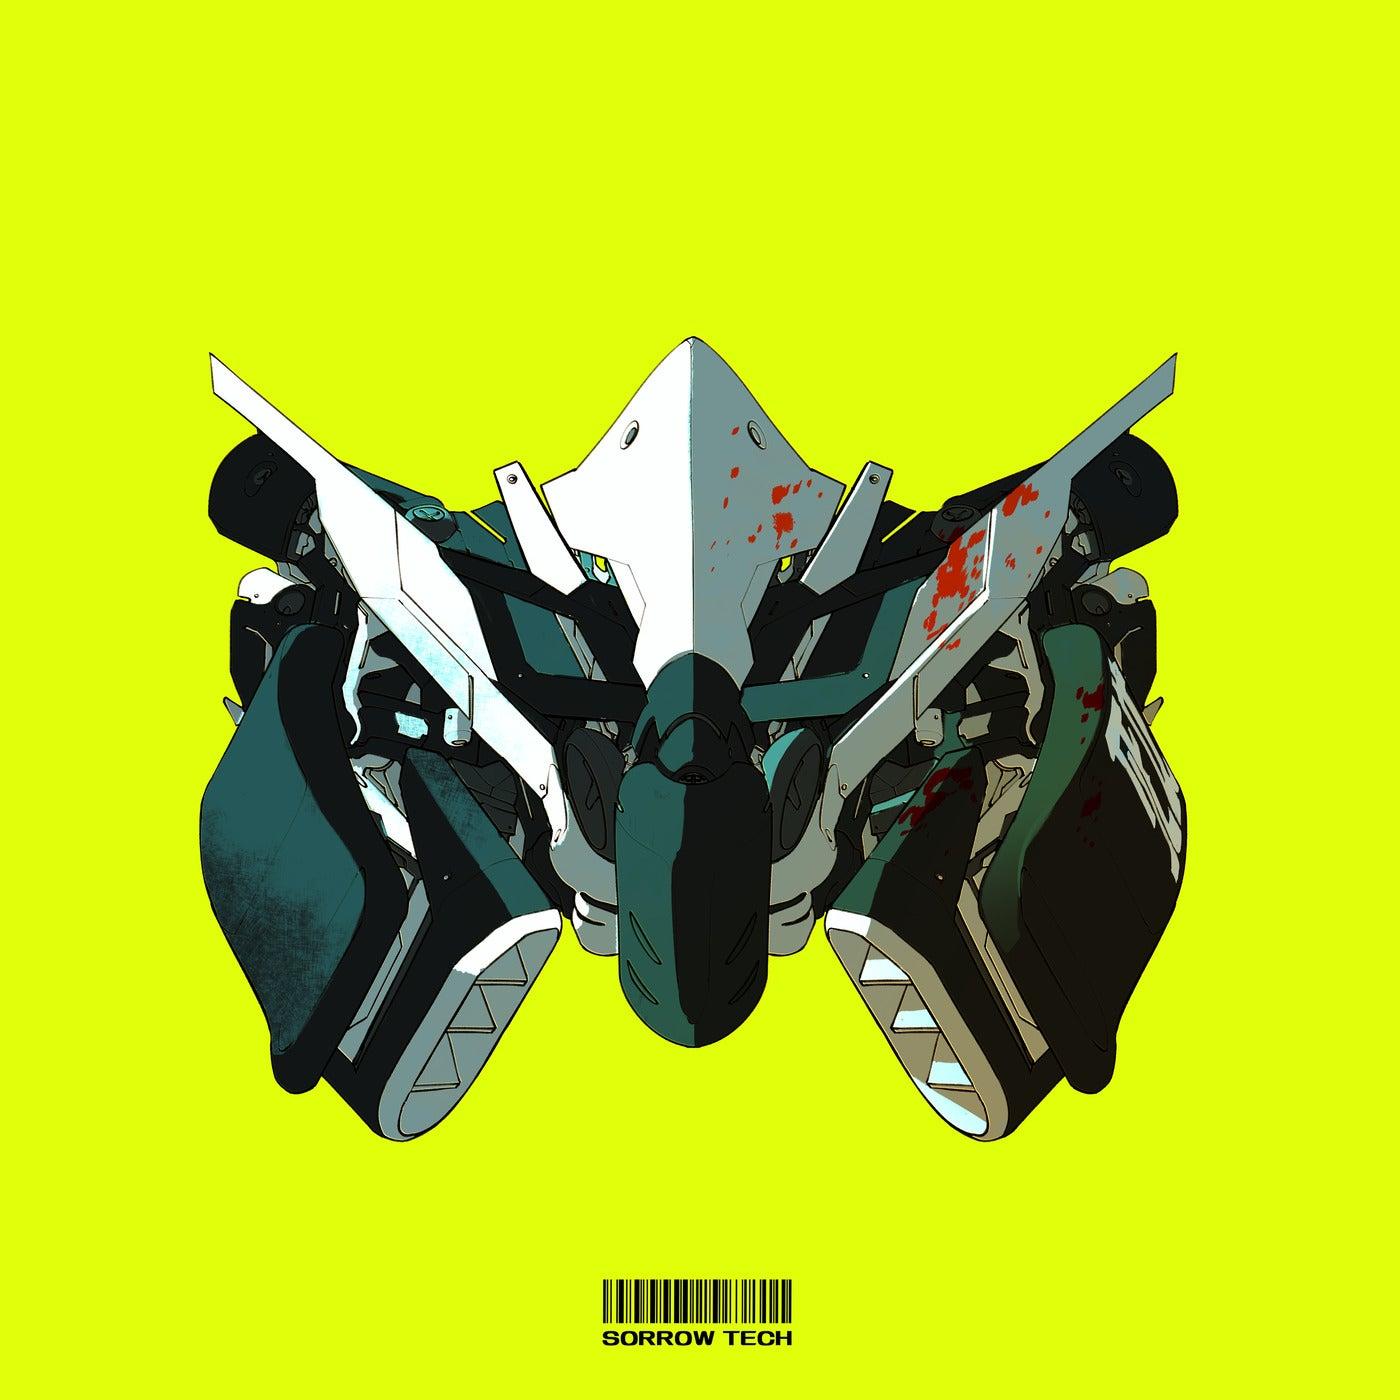 SORROW TECH (Original Mix)